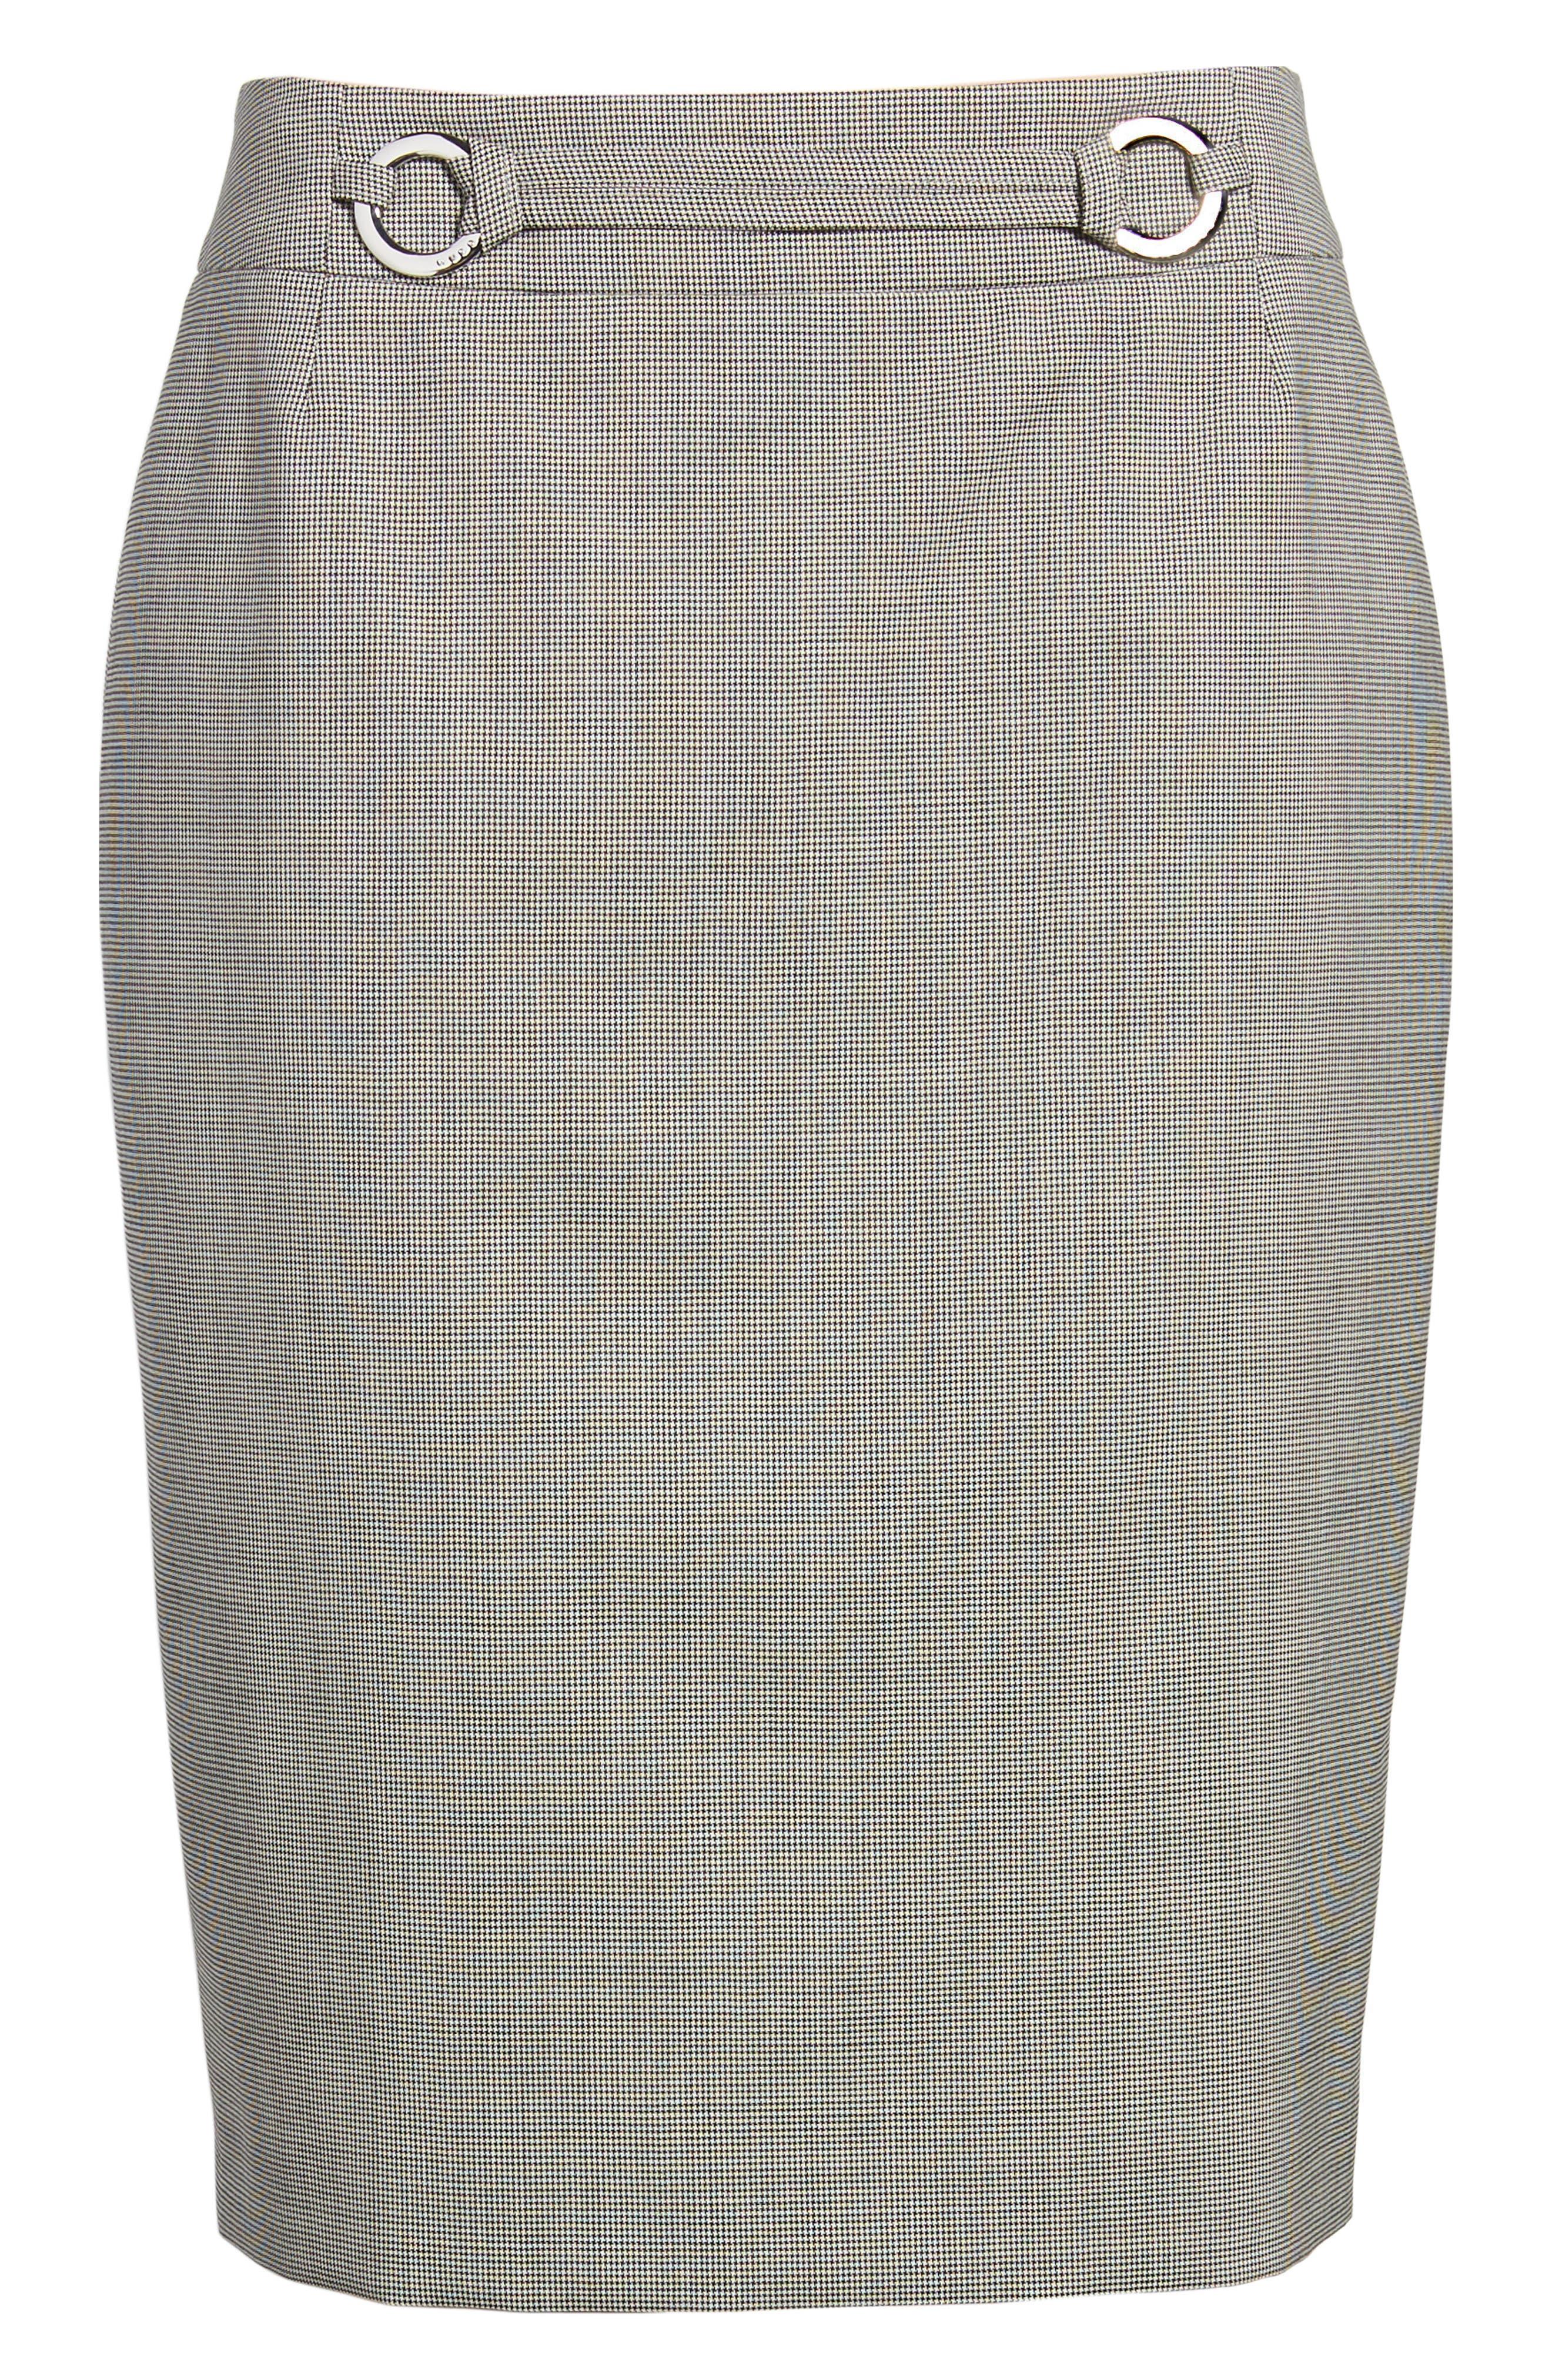 Vavilla Stretch Wool Suit Skirt,                             Alternate thumbnail 11, color,